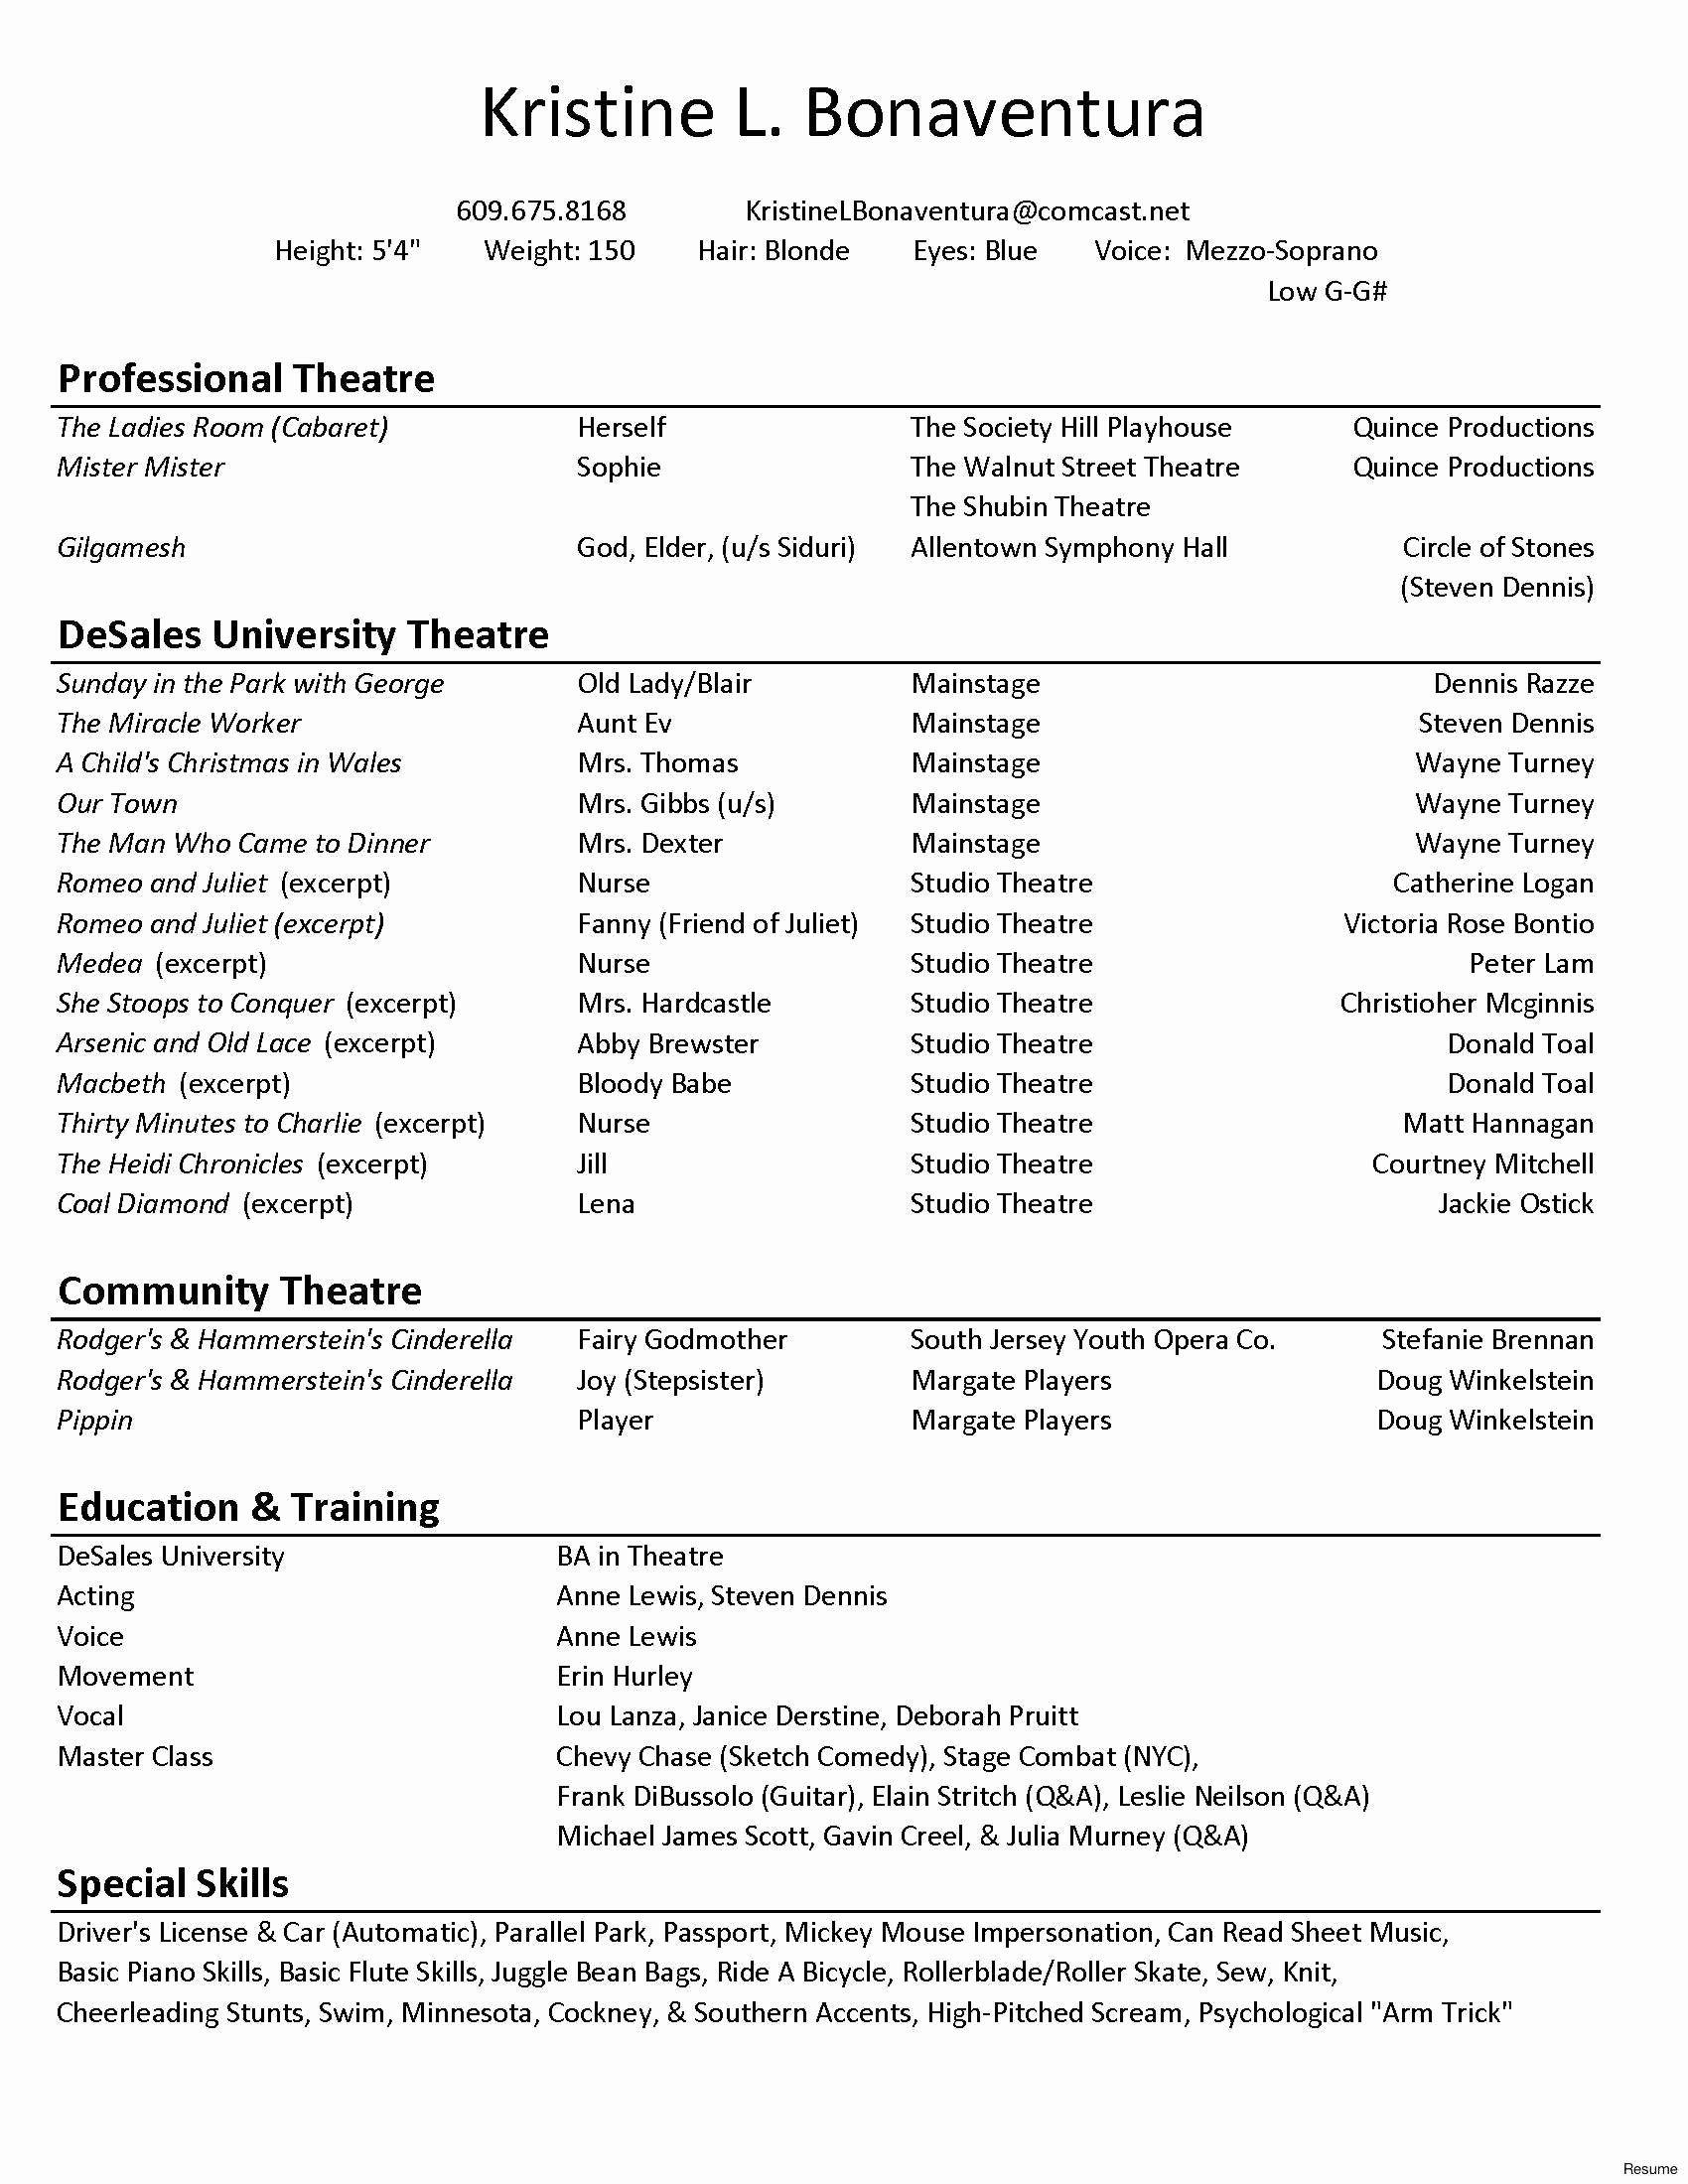 Technical Theatre Resume Template Inspirational Technical Theatre Resume Template Acting Resume Acting Resume Template Resume Template